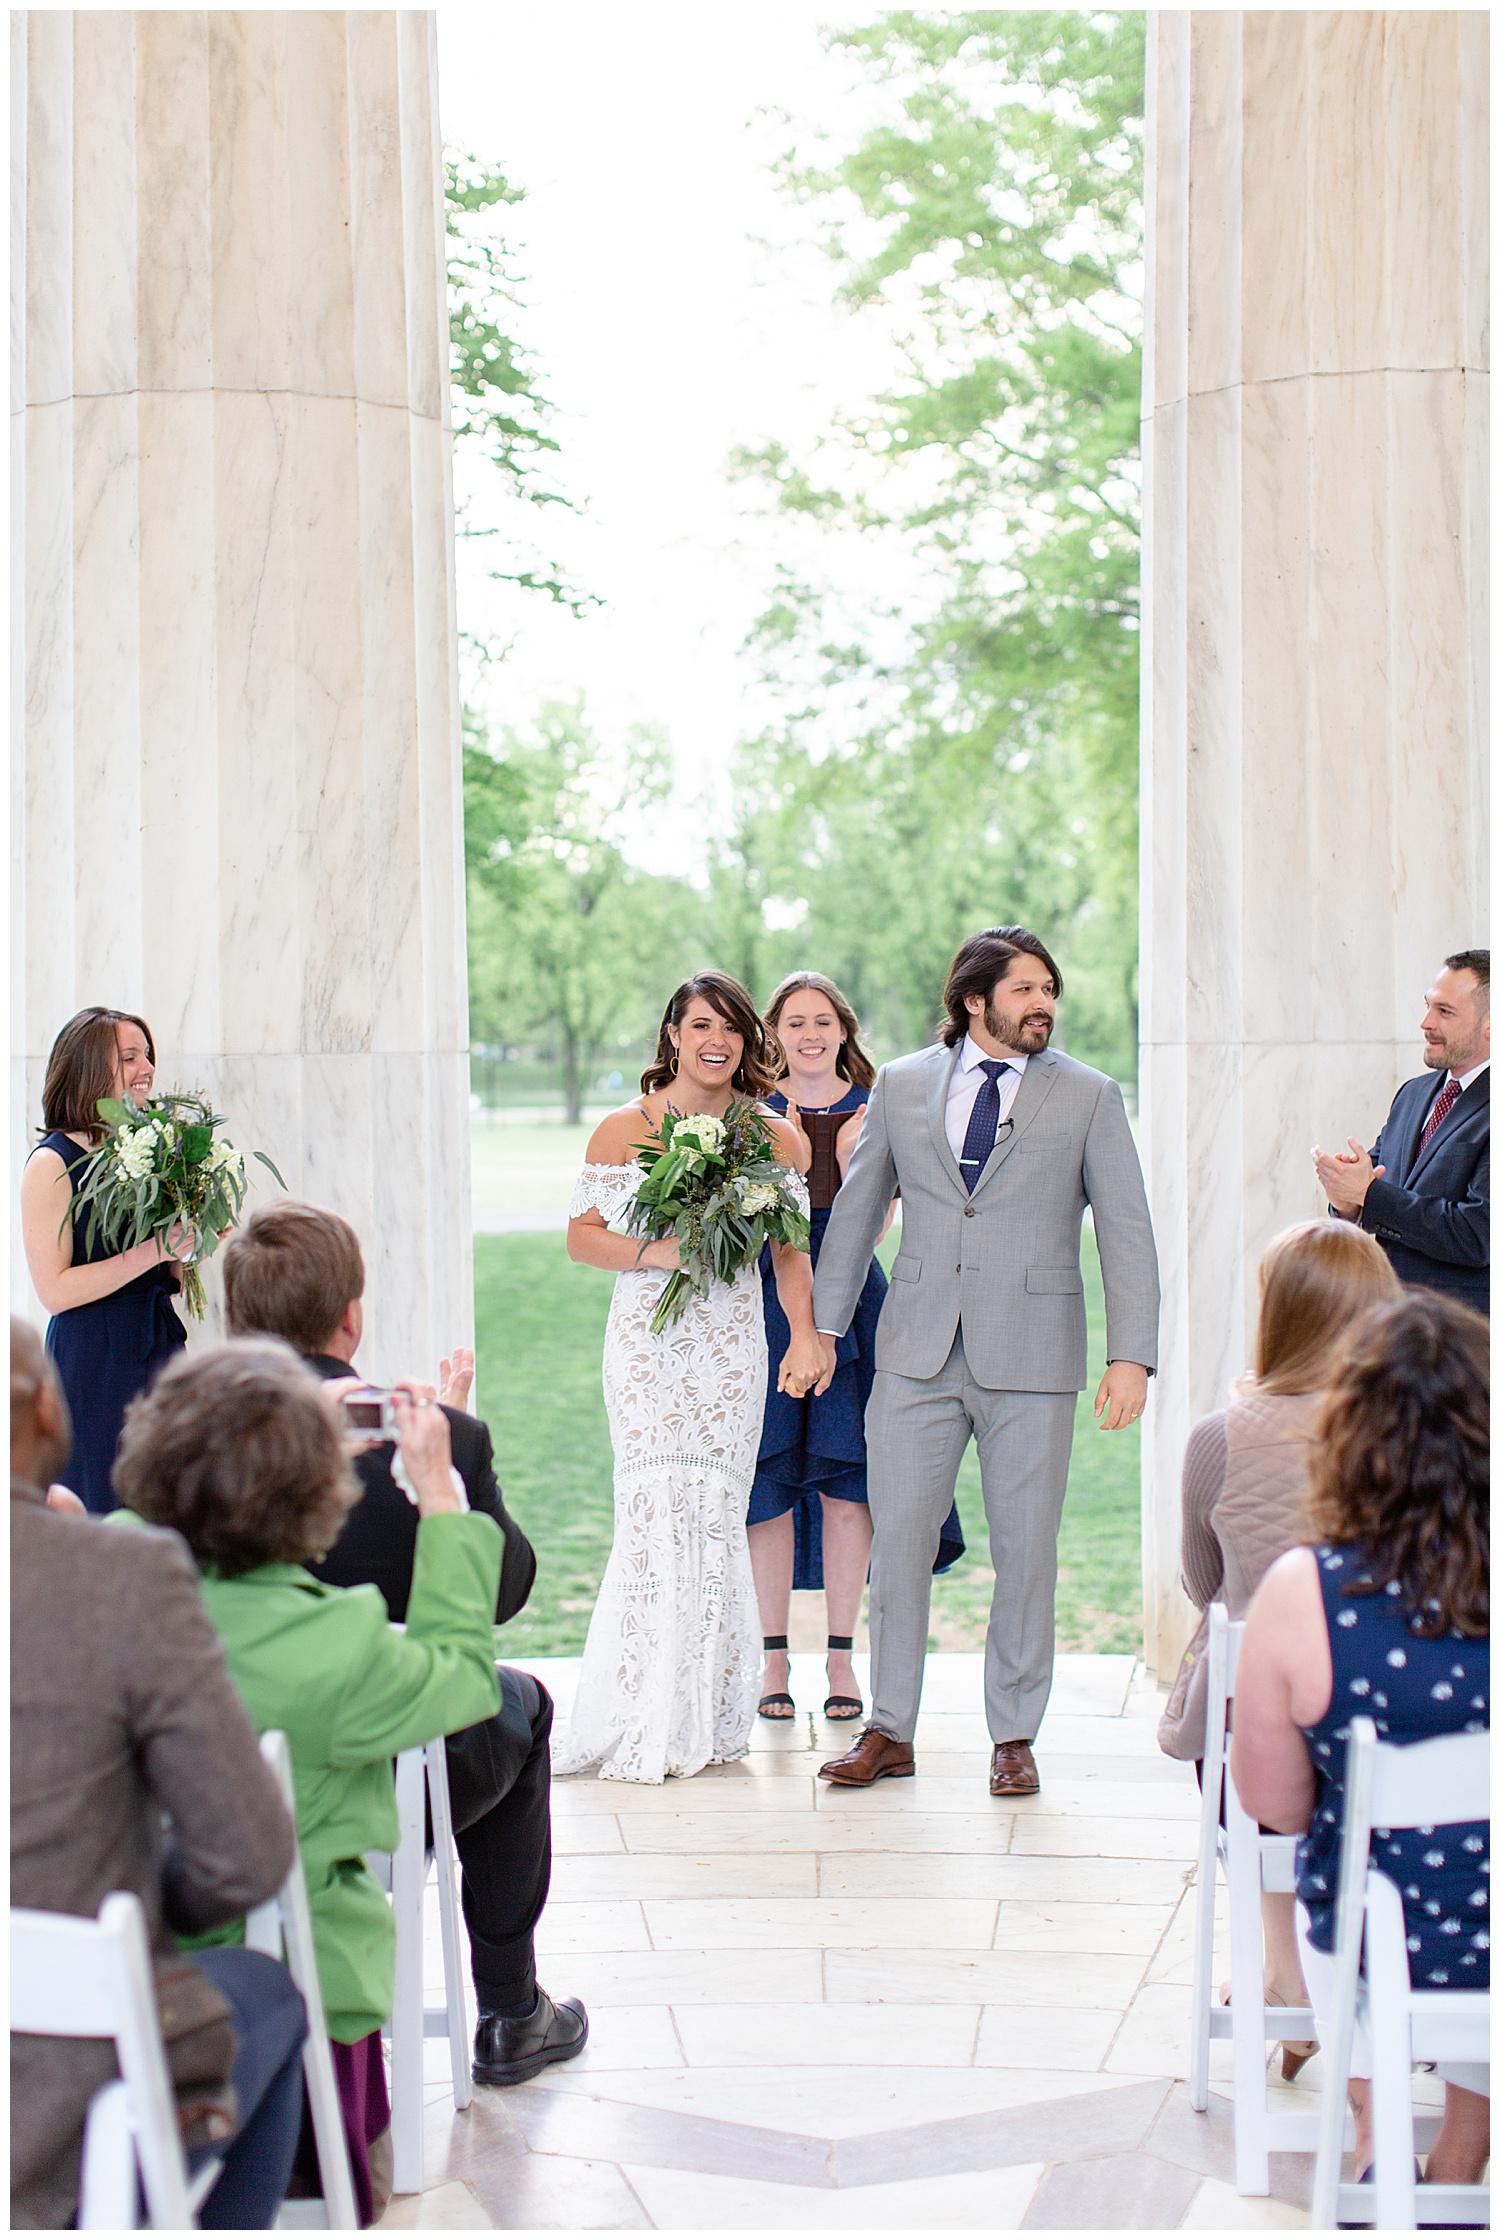 emily-belson-photography-washington-dc-wedding-18.jpg